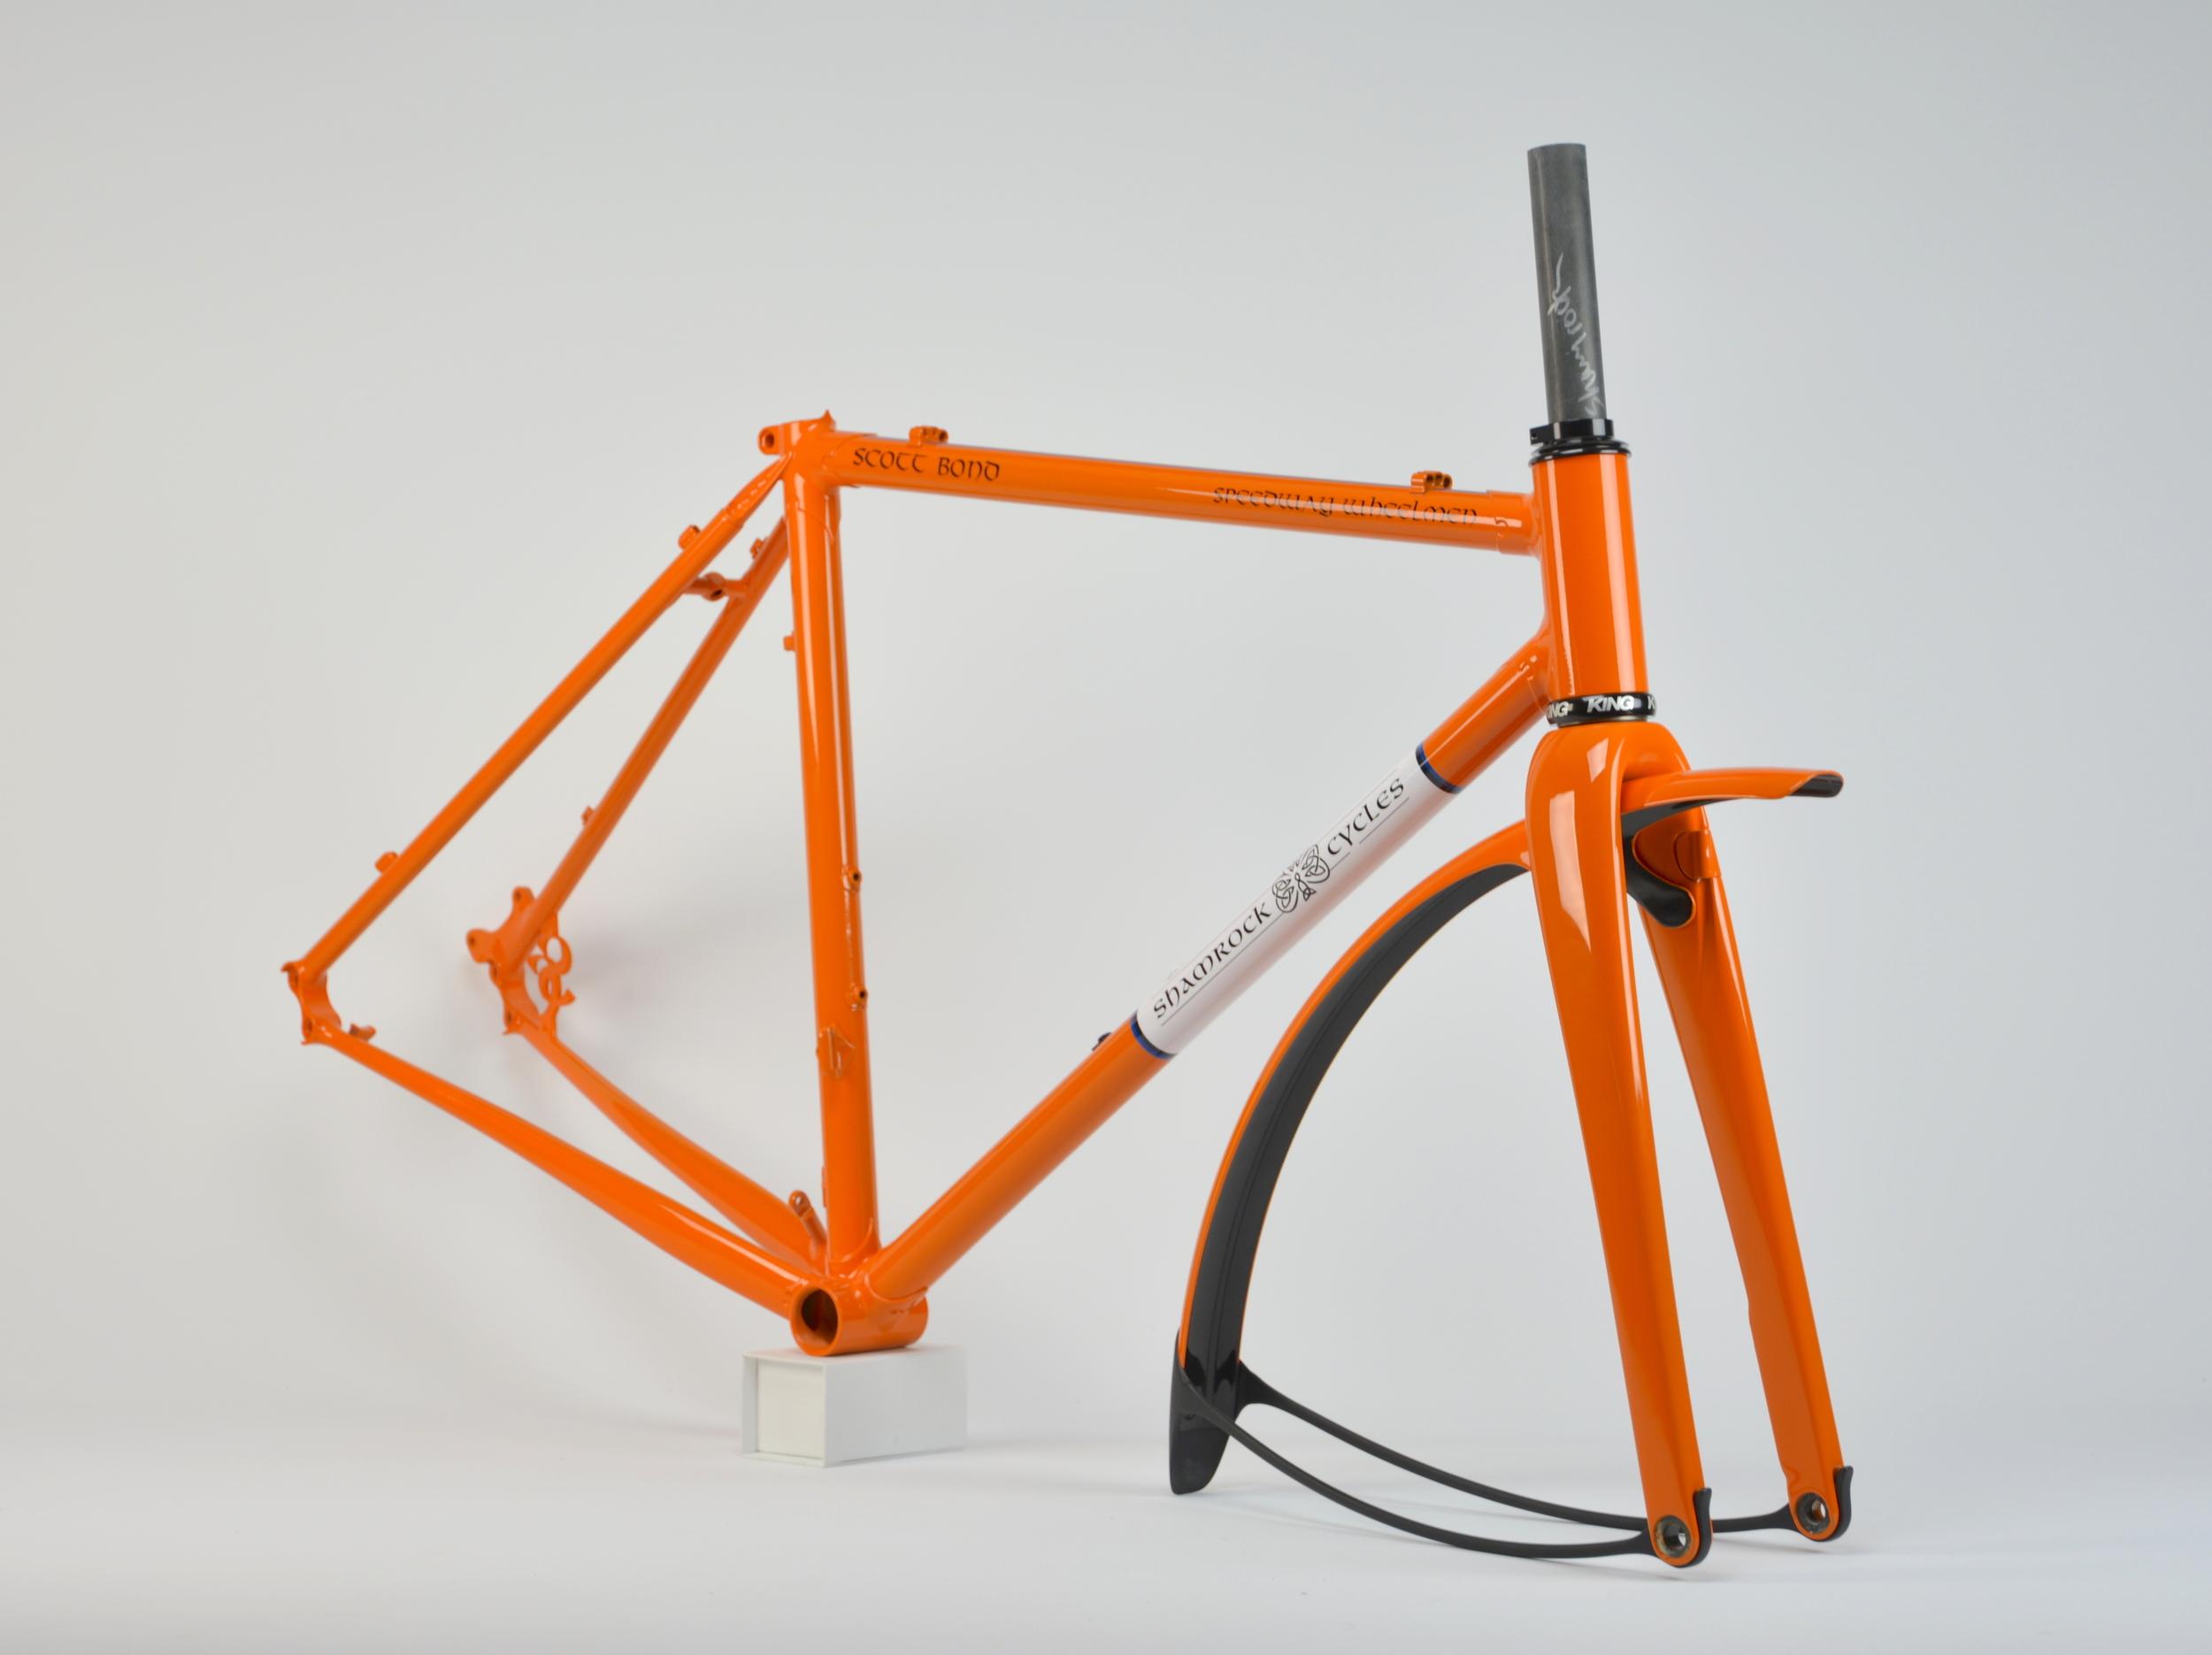 shamrock-cycles-gravel_26372853573_o.jpg